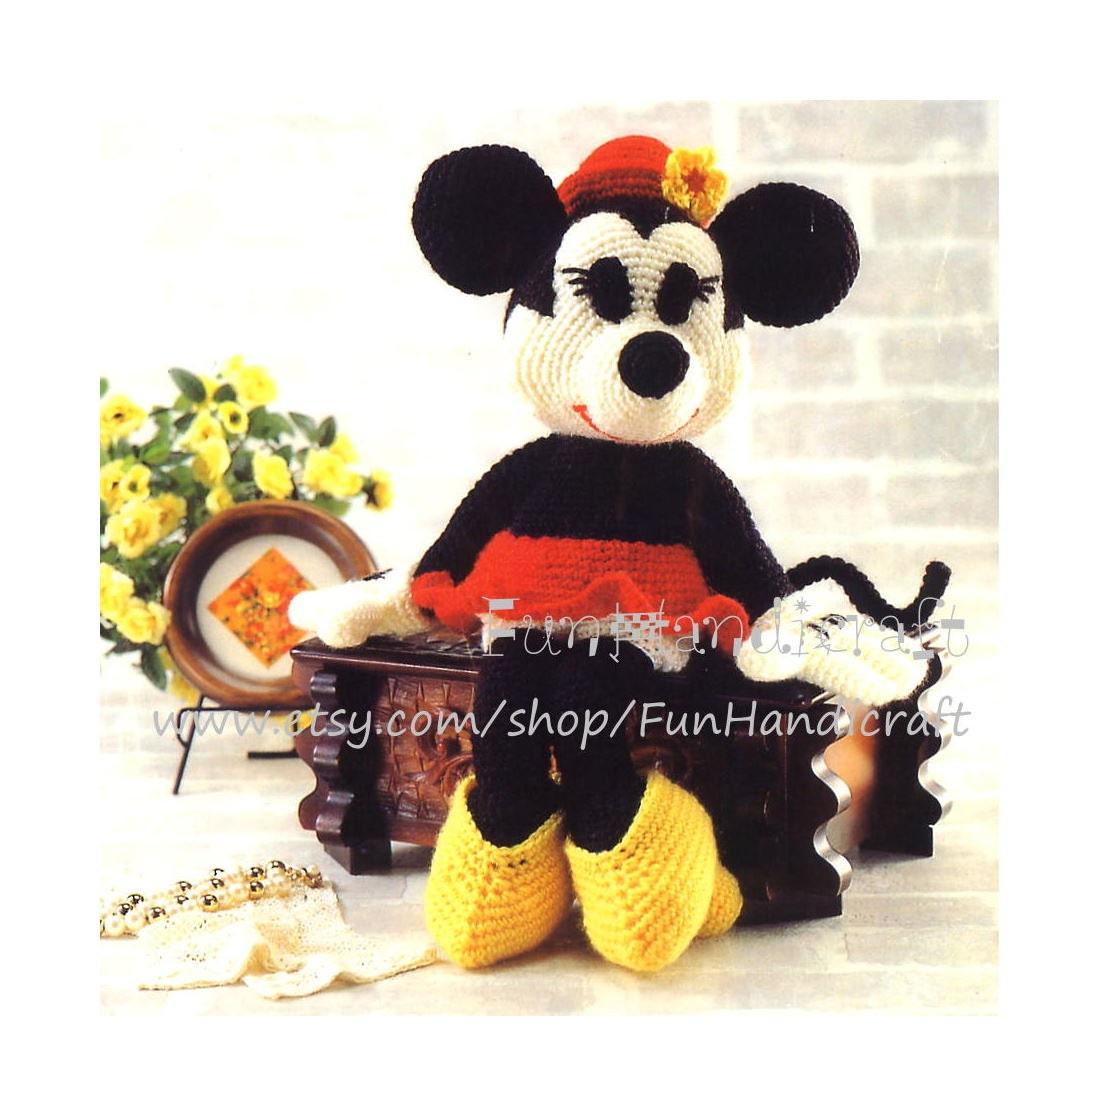 Minnie Mouse Amigurumi Crochet Pattern : Disney Minnie Mouse Amigurumi Pattern in English by ...